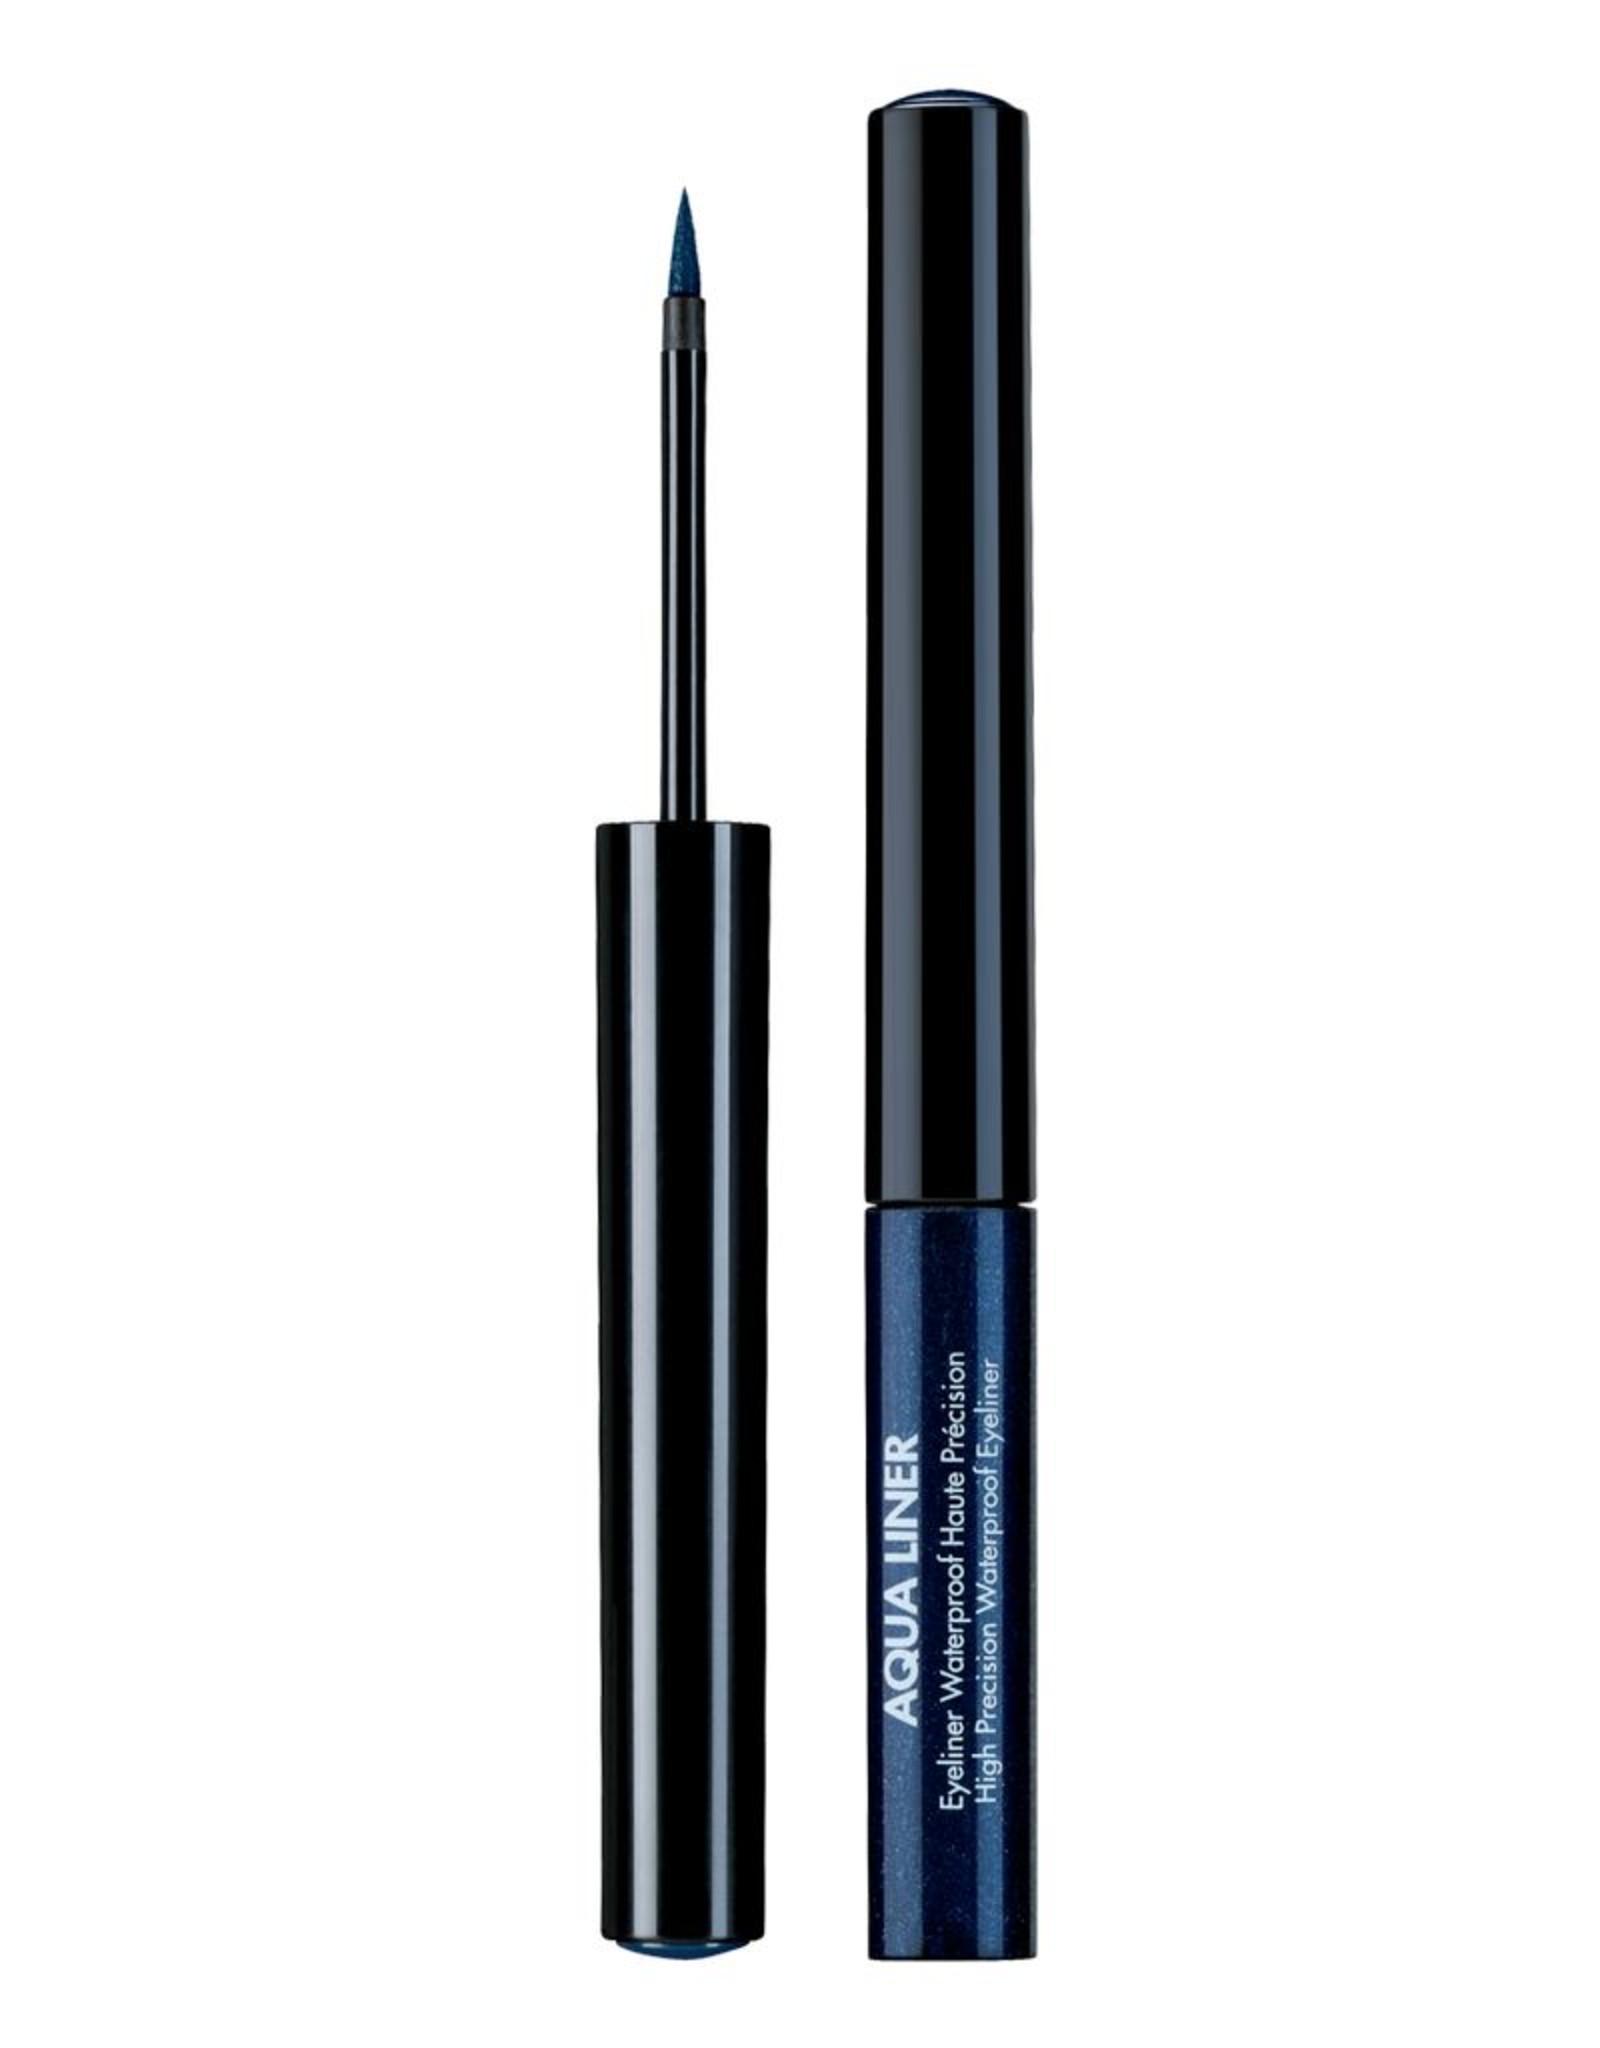 MUFE AQUALINER  1,7ml WPFN6 Bleu Marine Irise / Iridescent Navy Blue